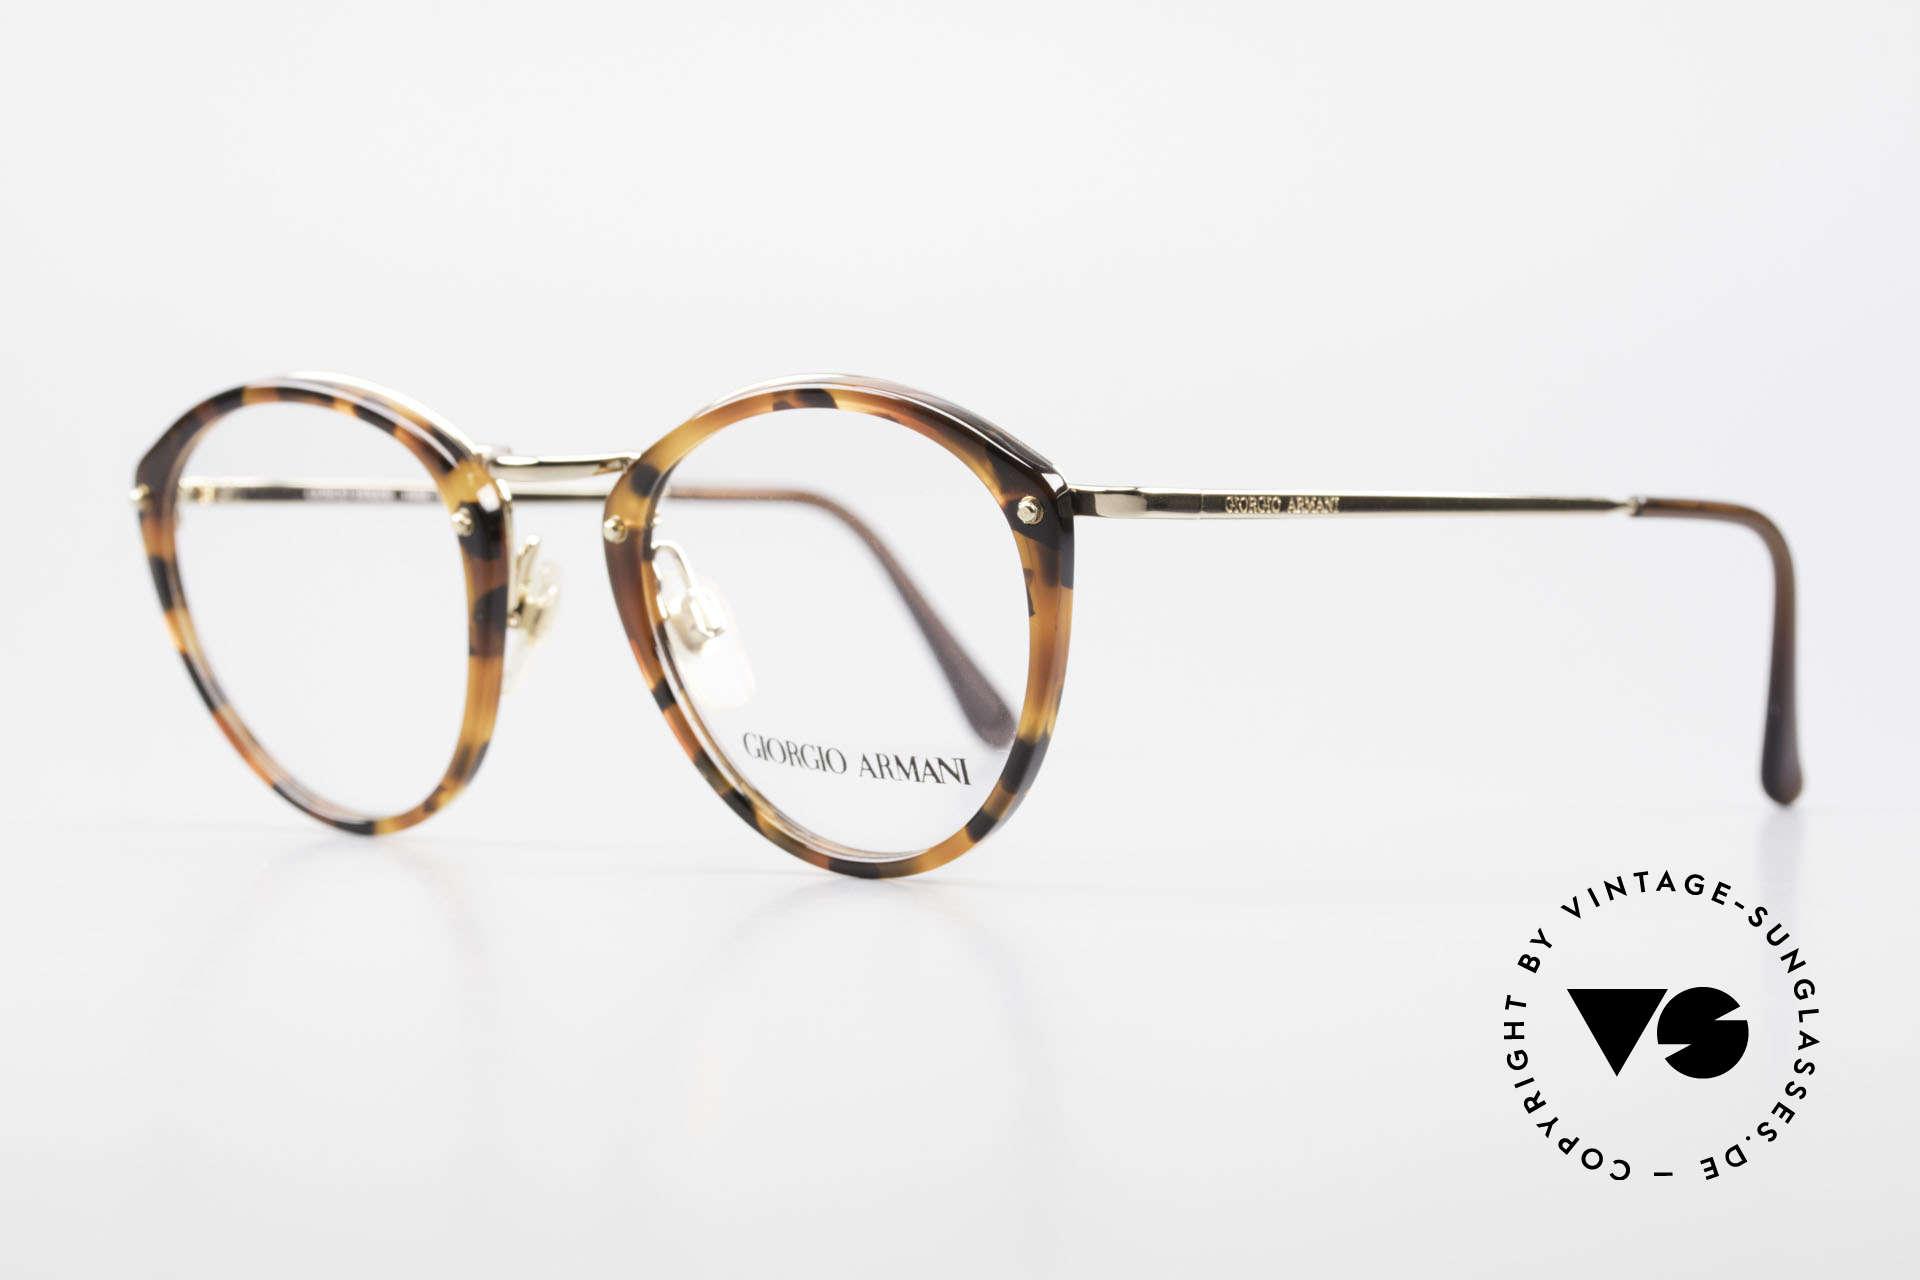 Giorgio Armani 354 No Retro Glasses 80's Frame, tortoise frame + golden bridge and gold metal temples, Made for Men and Women